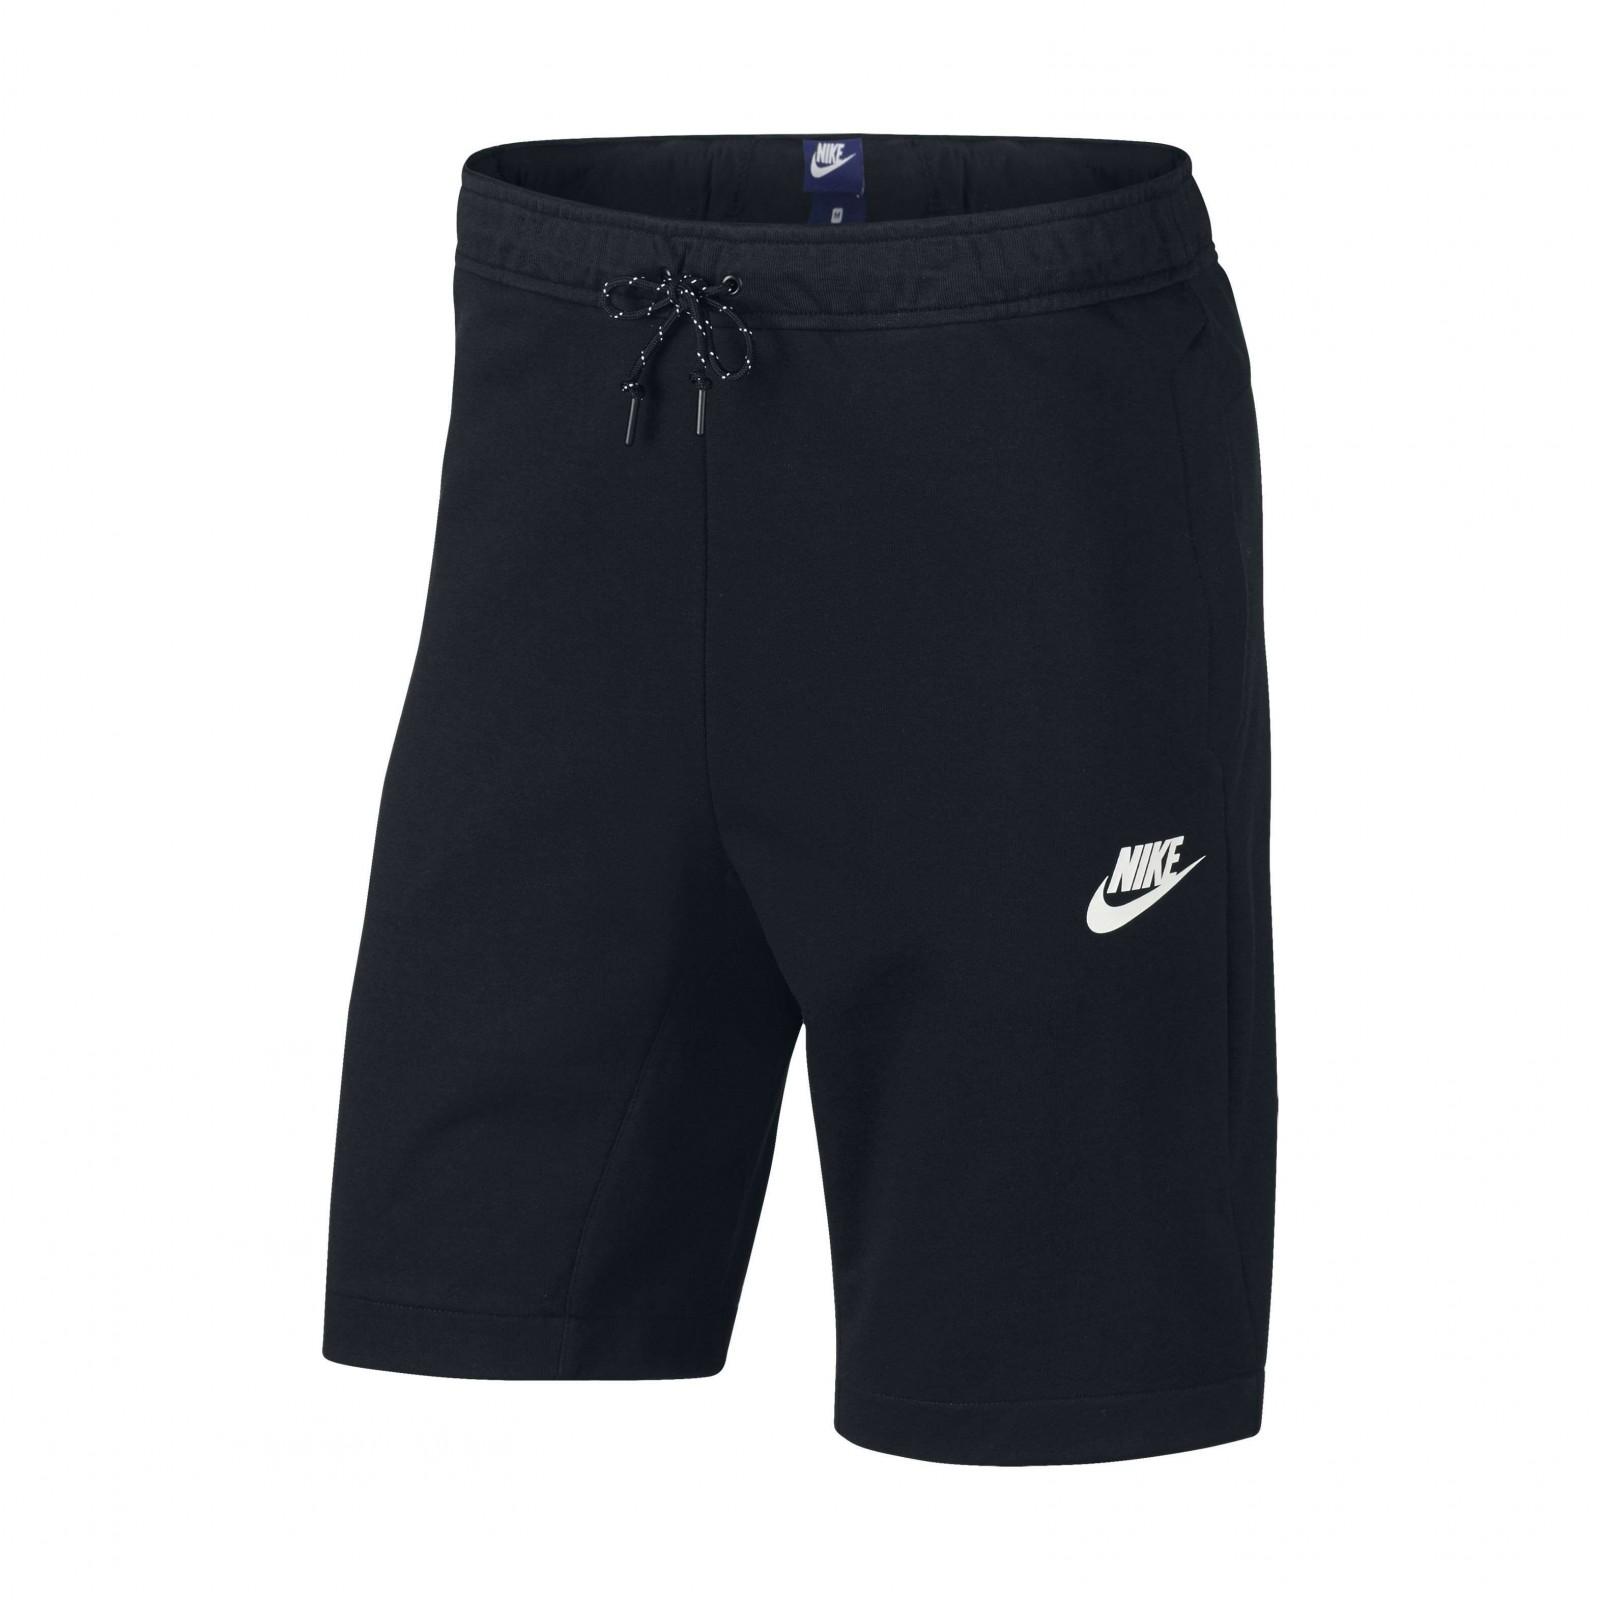 fa5157b8c7b Pánské kraťasy Nike M NSW AV15 FLC SHORT BLACK BLACK WHITE - Glami.cz